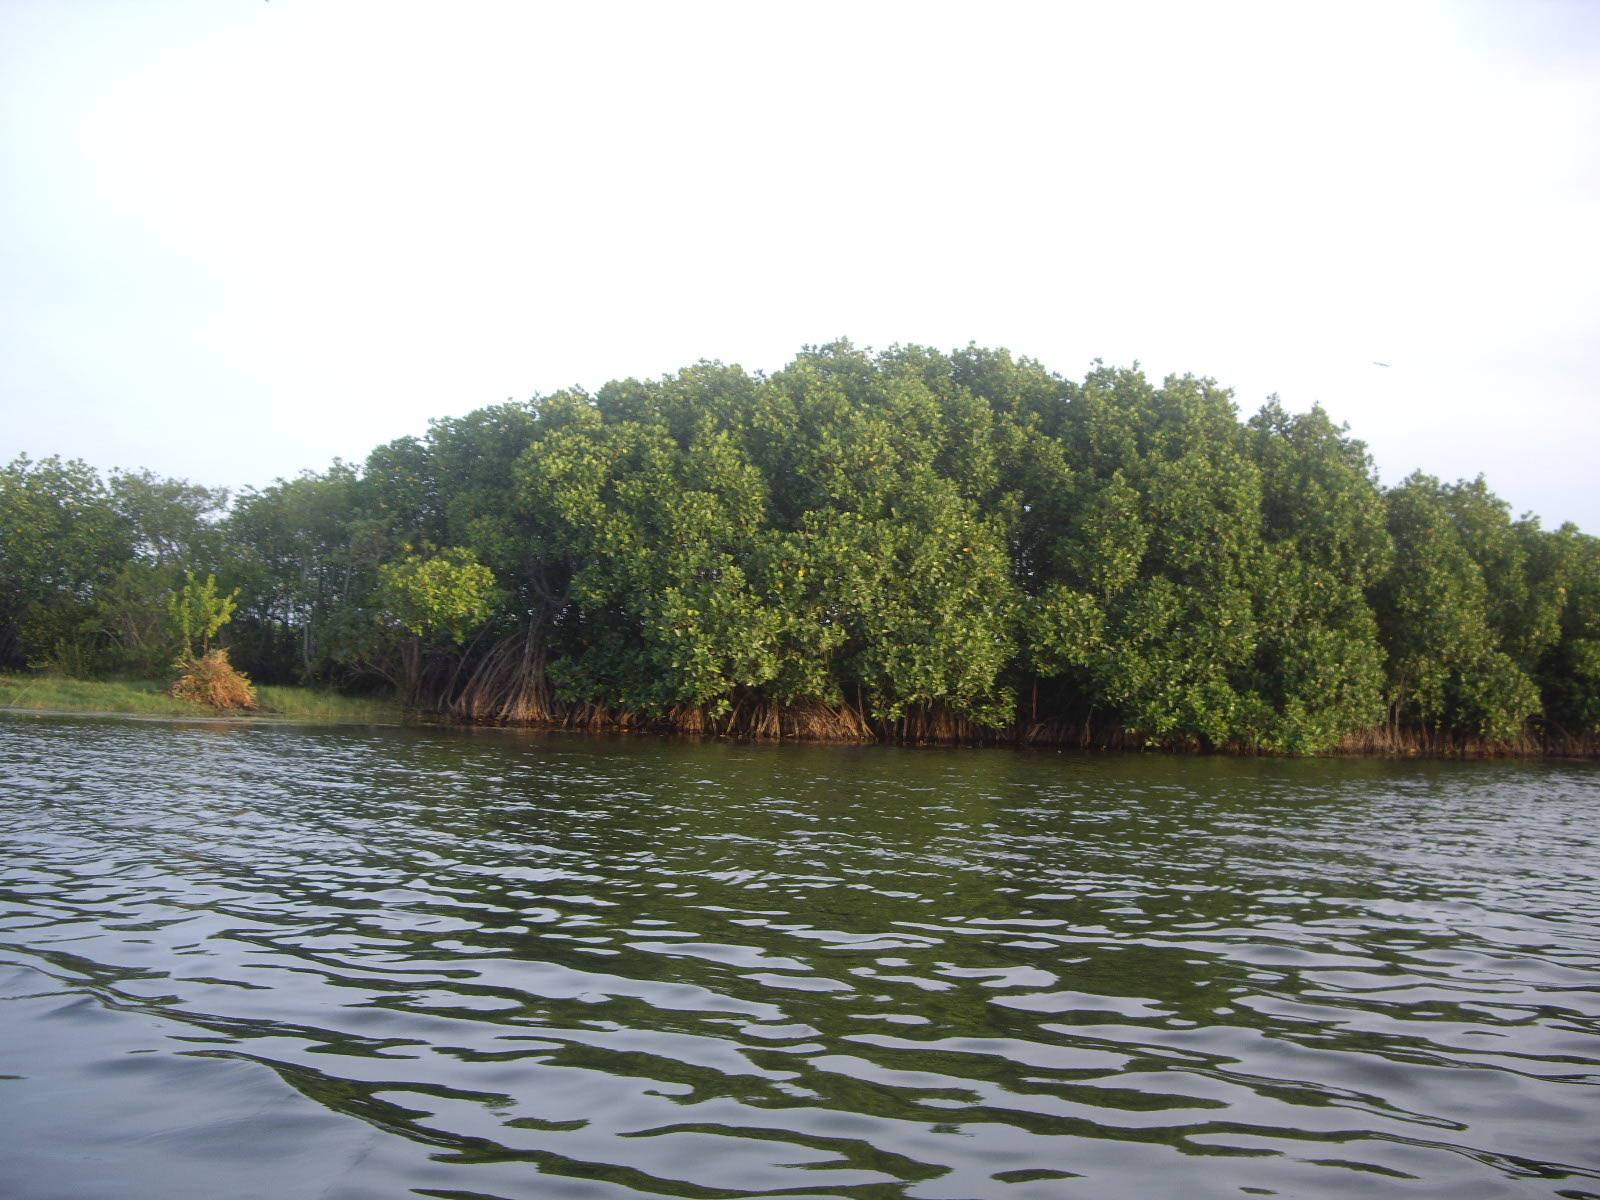 Photo 3: Un ballade dans la Mangrove